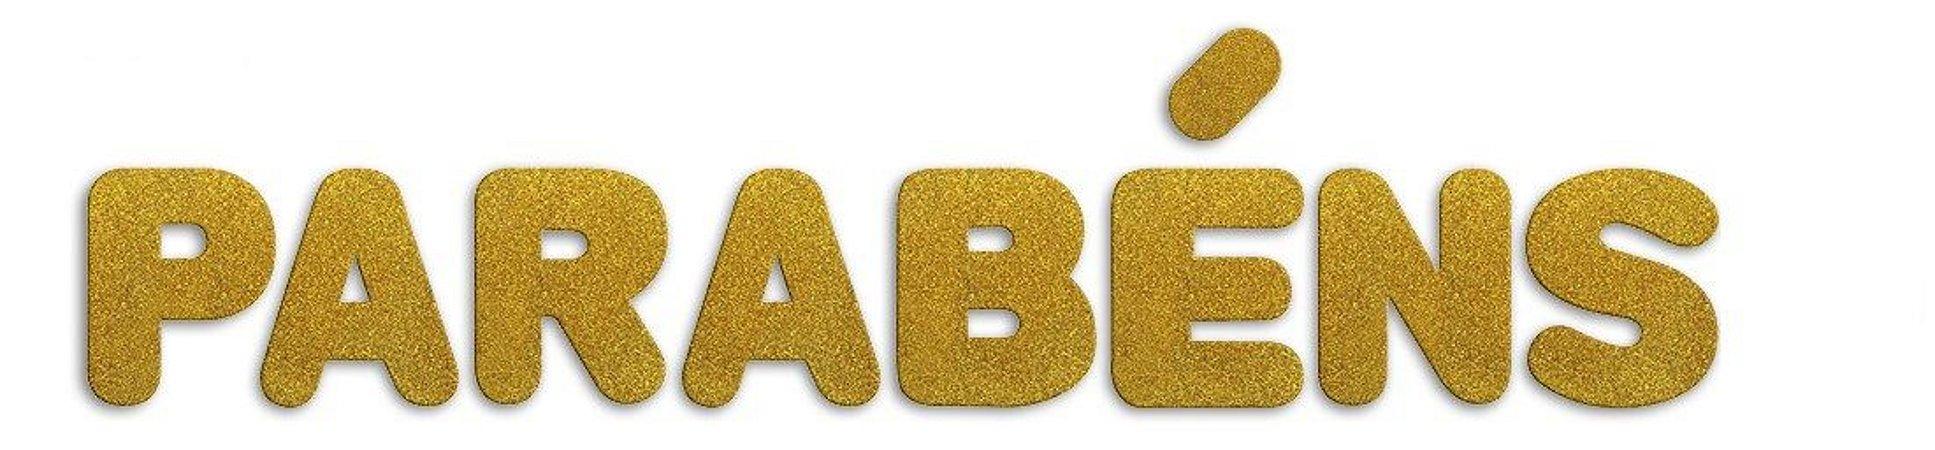 Letreiro E.V.A. C/ Glitter 12cm - Parabéns (Ouro) - Make+